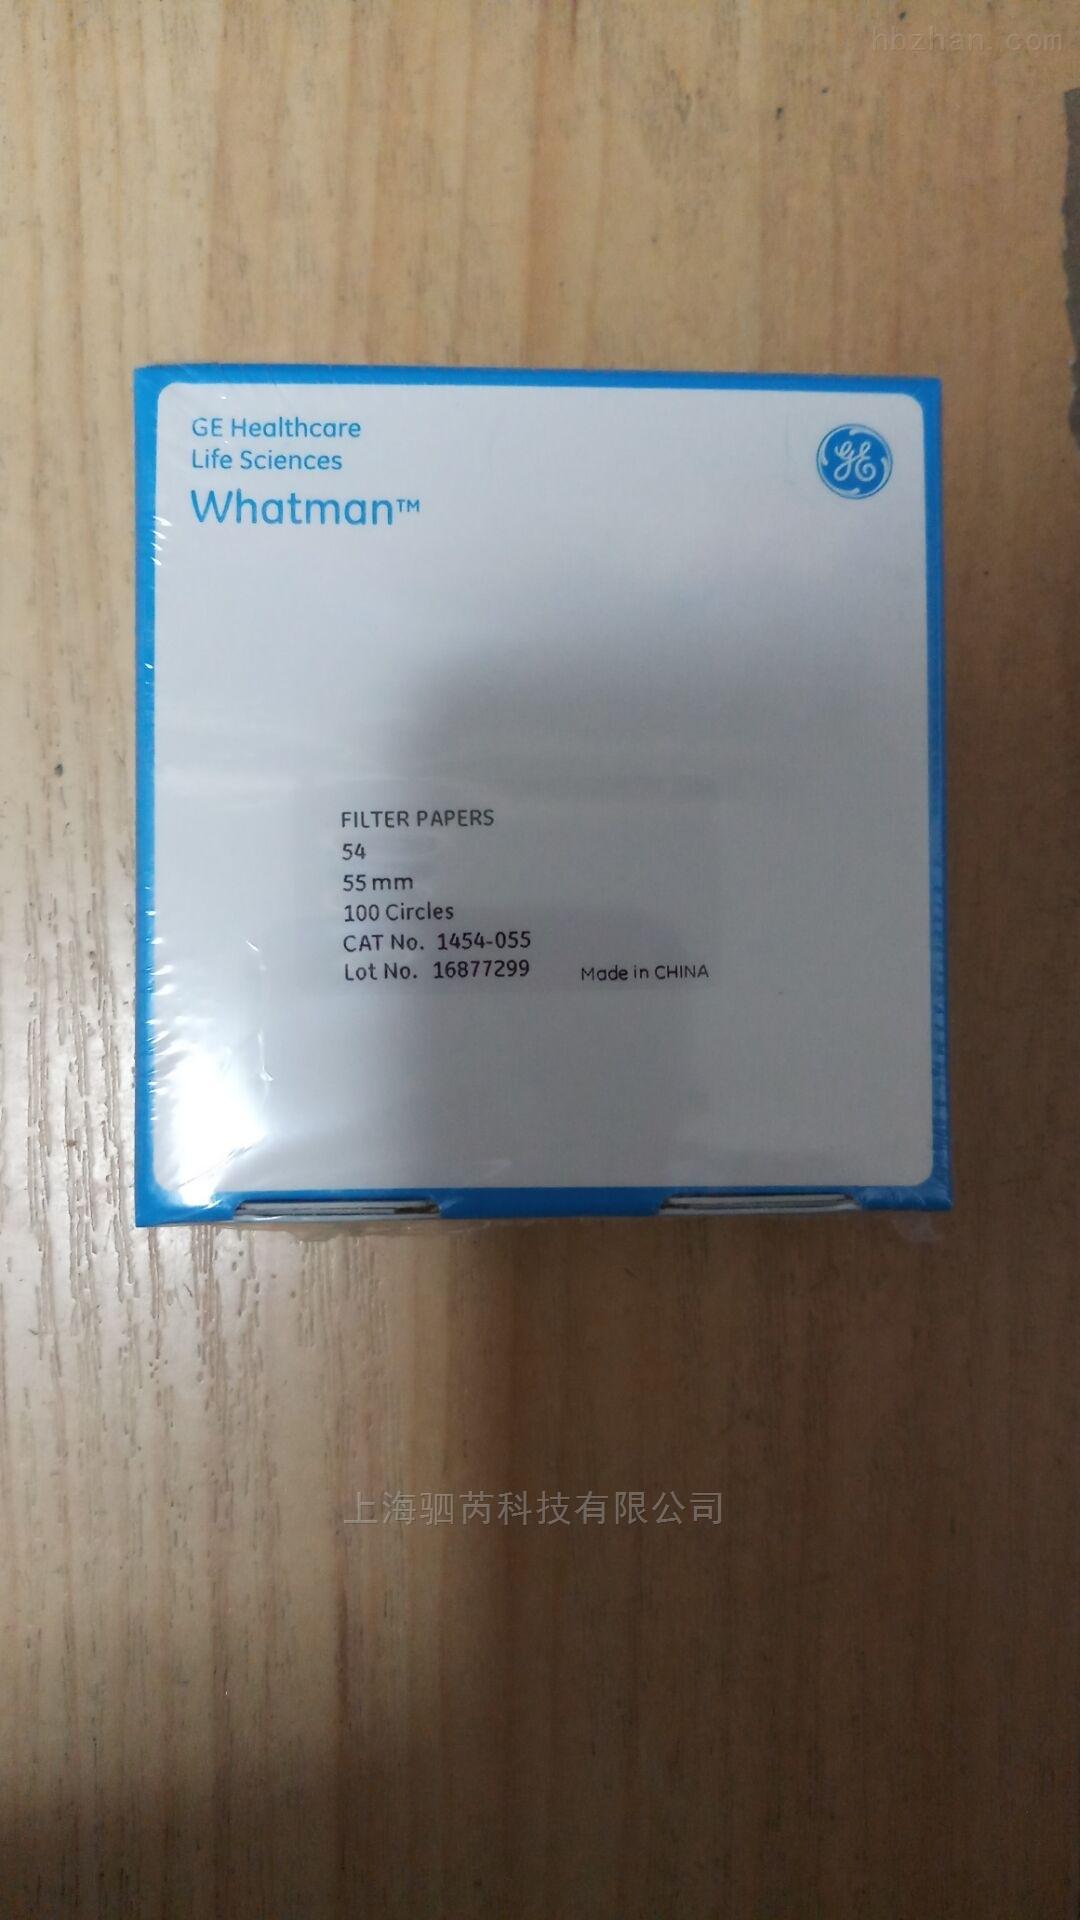 whatman54号滤纸1454-055